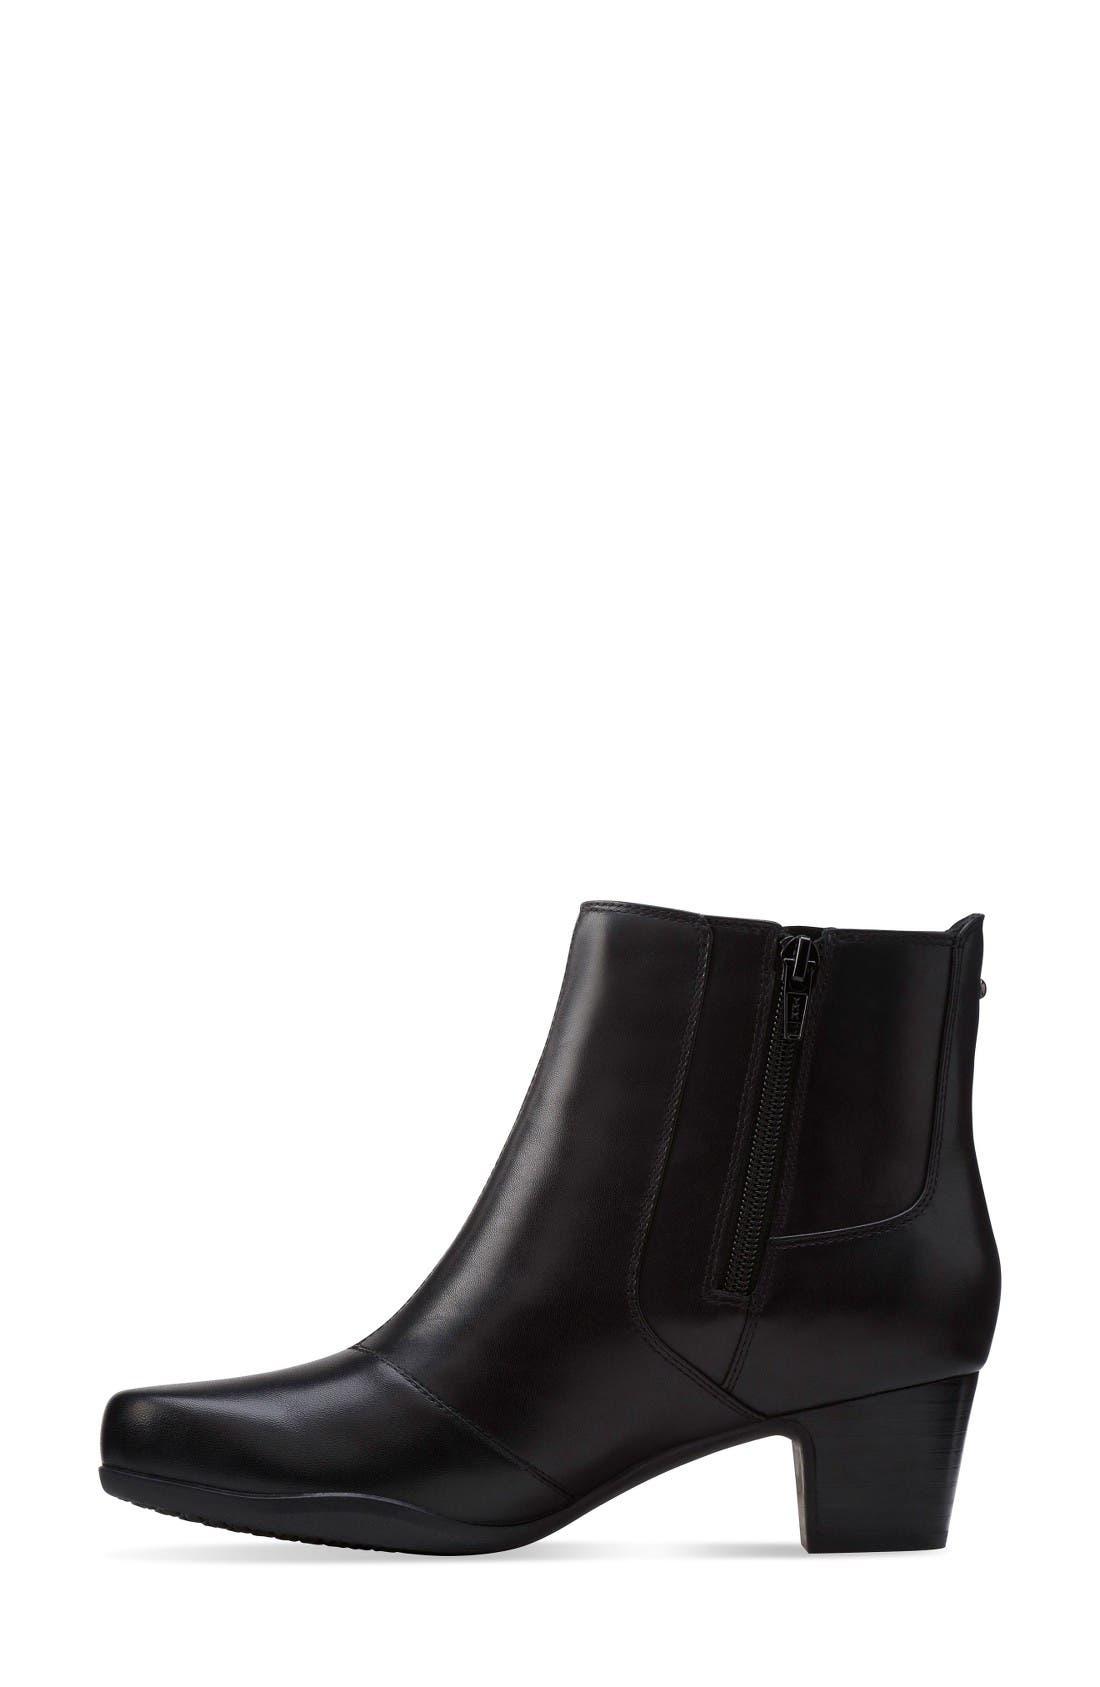 Rosalyn Lara Waterproof Boot,                             Alternate thumbnail 2, color,                             Black Leather